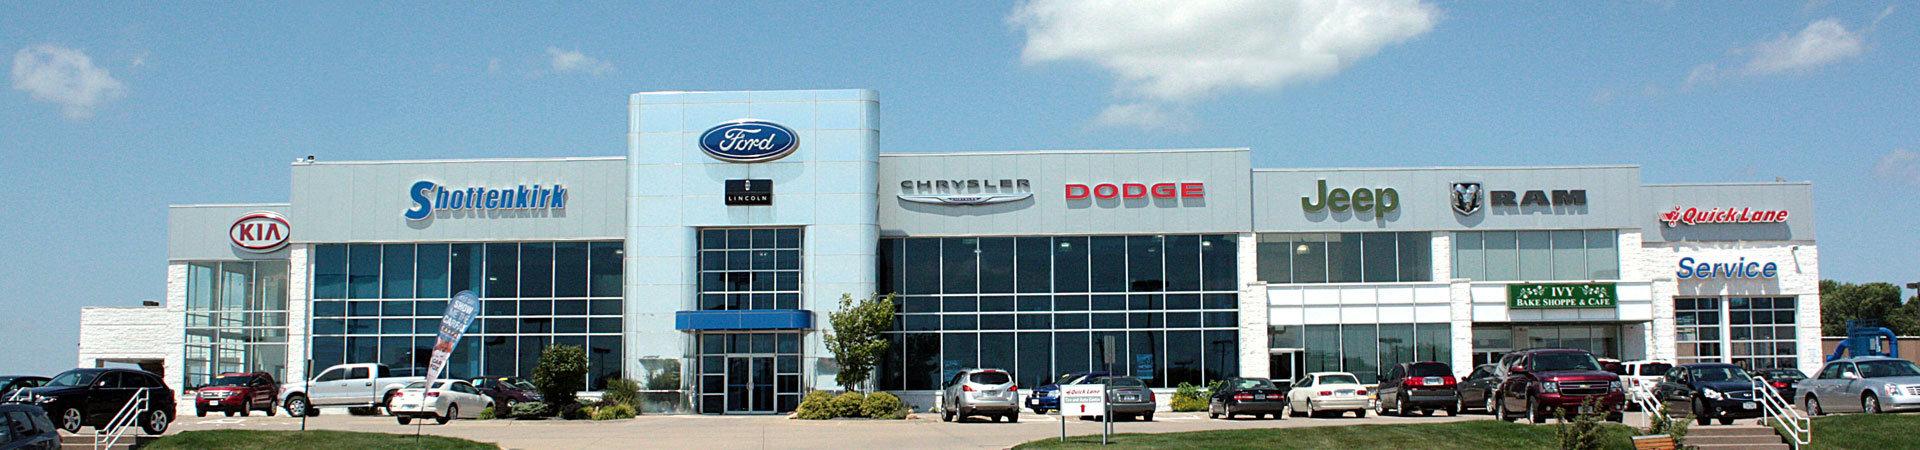 Shottenkirk Mount Pleasant Iowa >> West Burlington Lincoln Jeep Kia Chrysler Dodge Jeep Ford